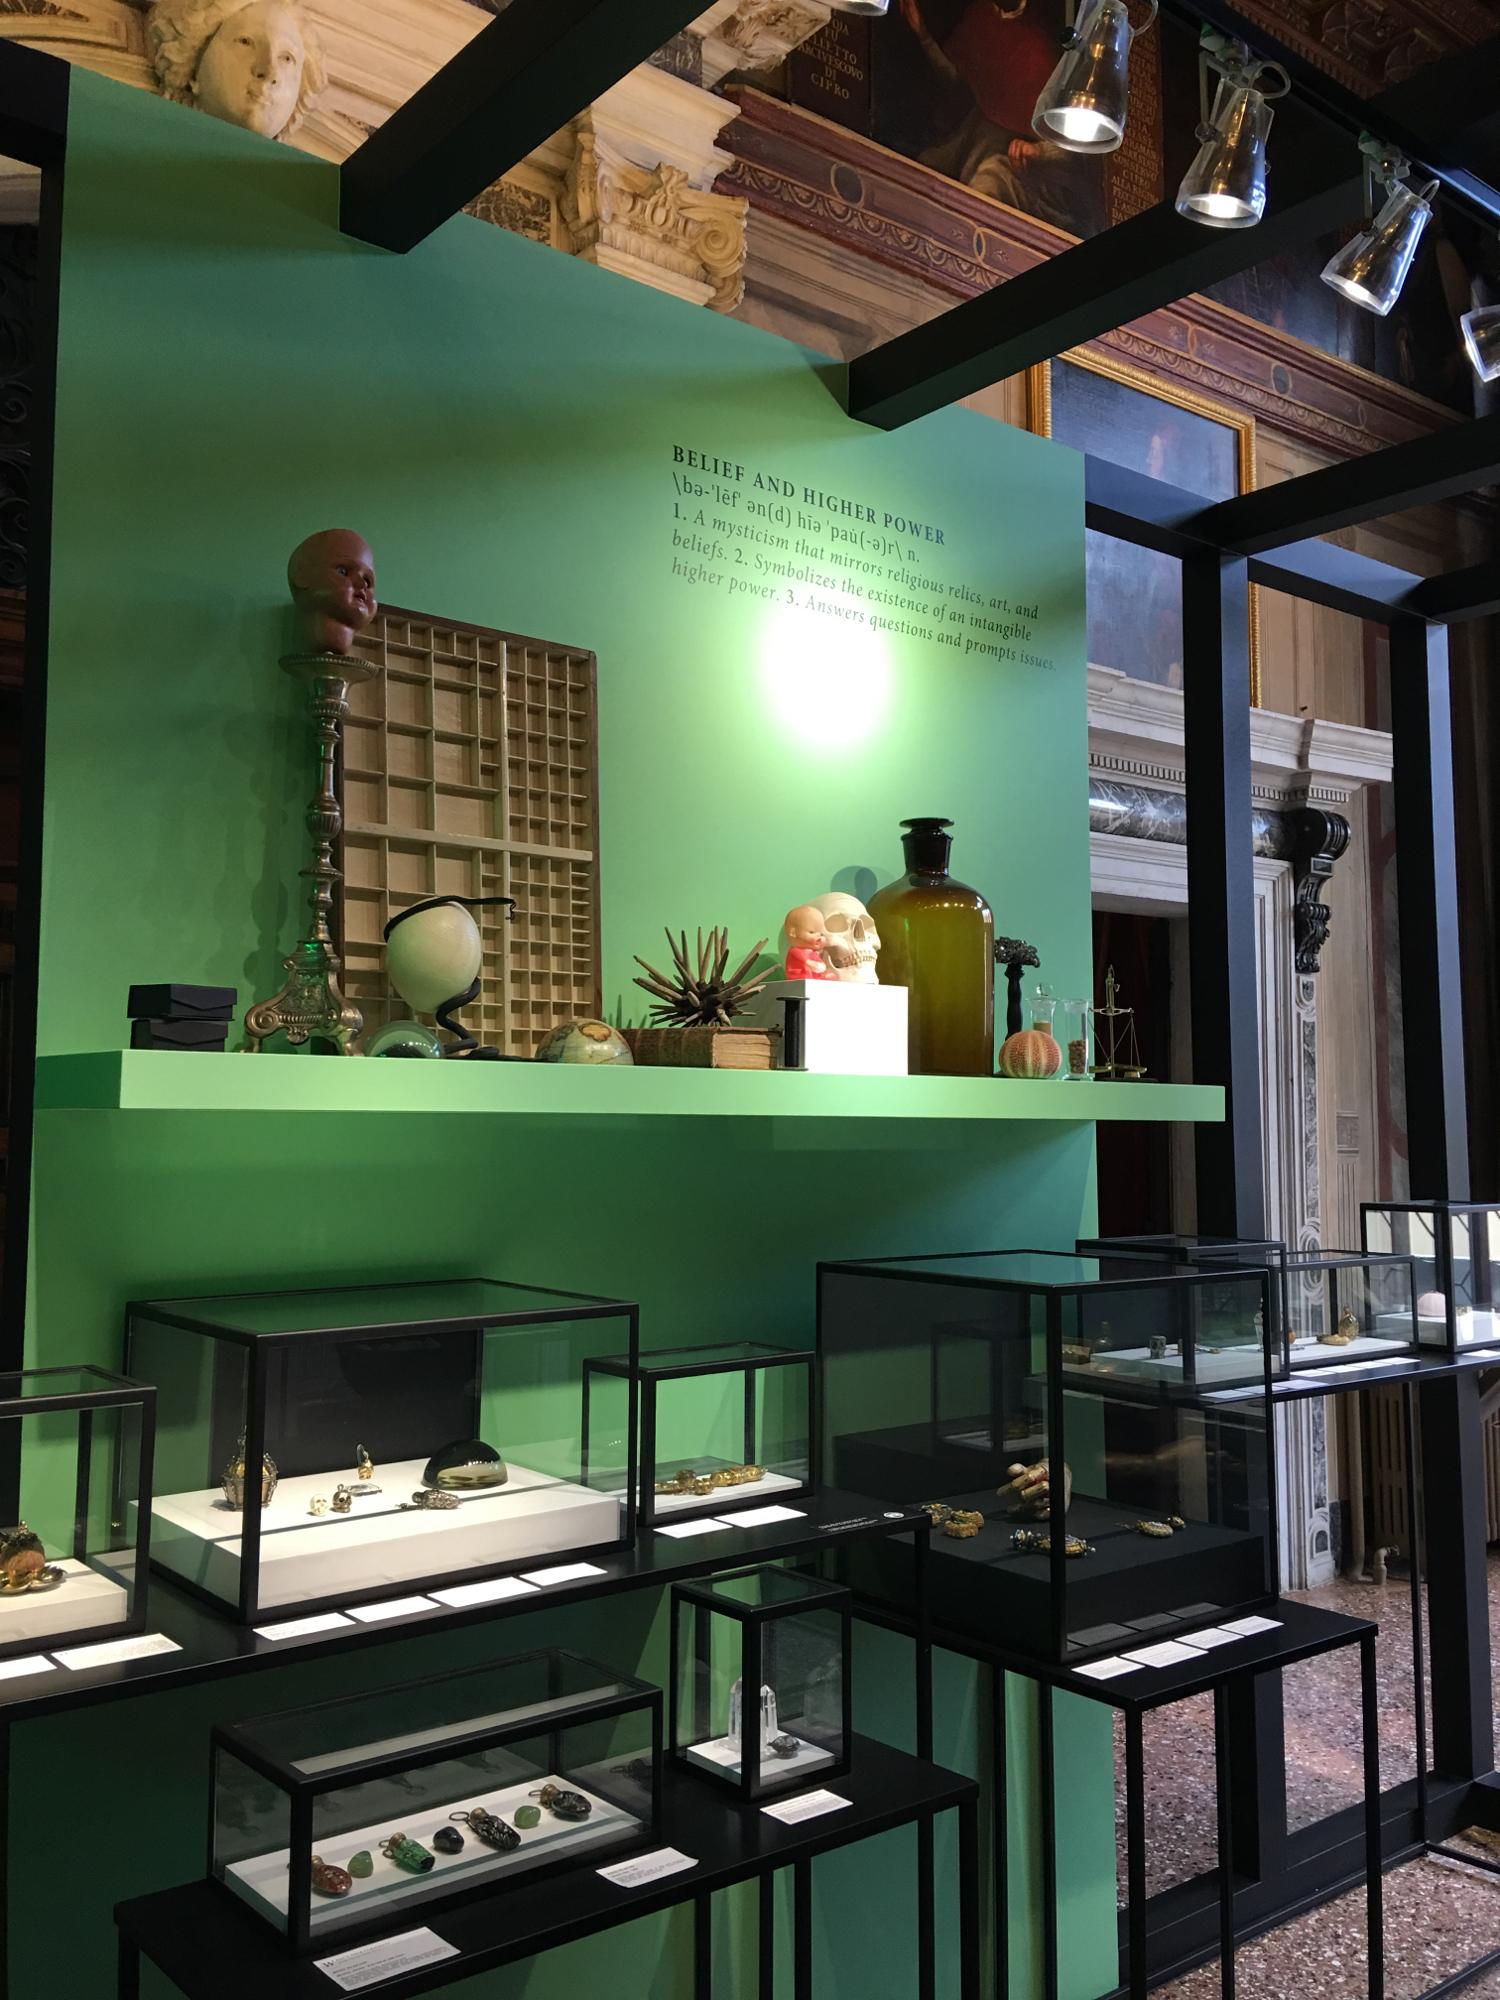 rocaille-blog-venezia-palazzo-mocenigo-cabinet-of-curiosities-collezione-storp-profumo-1